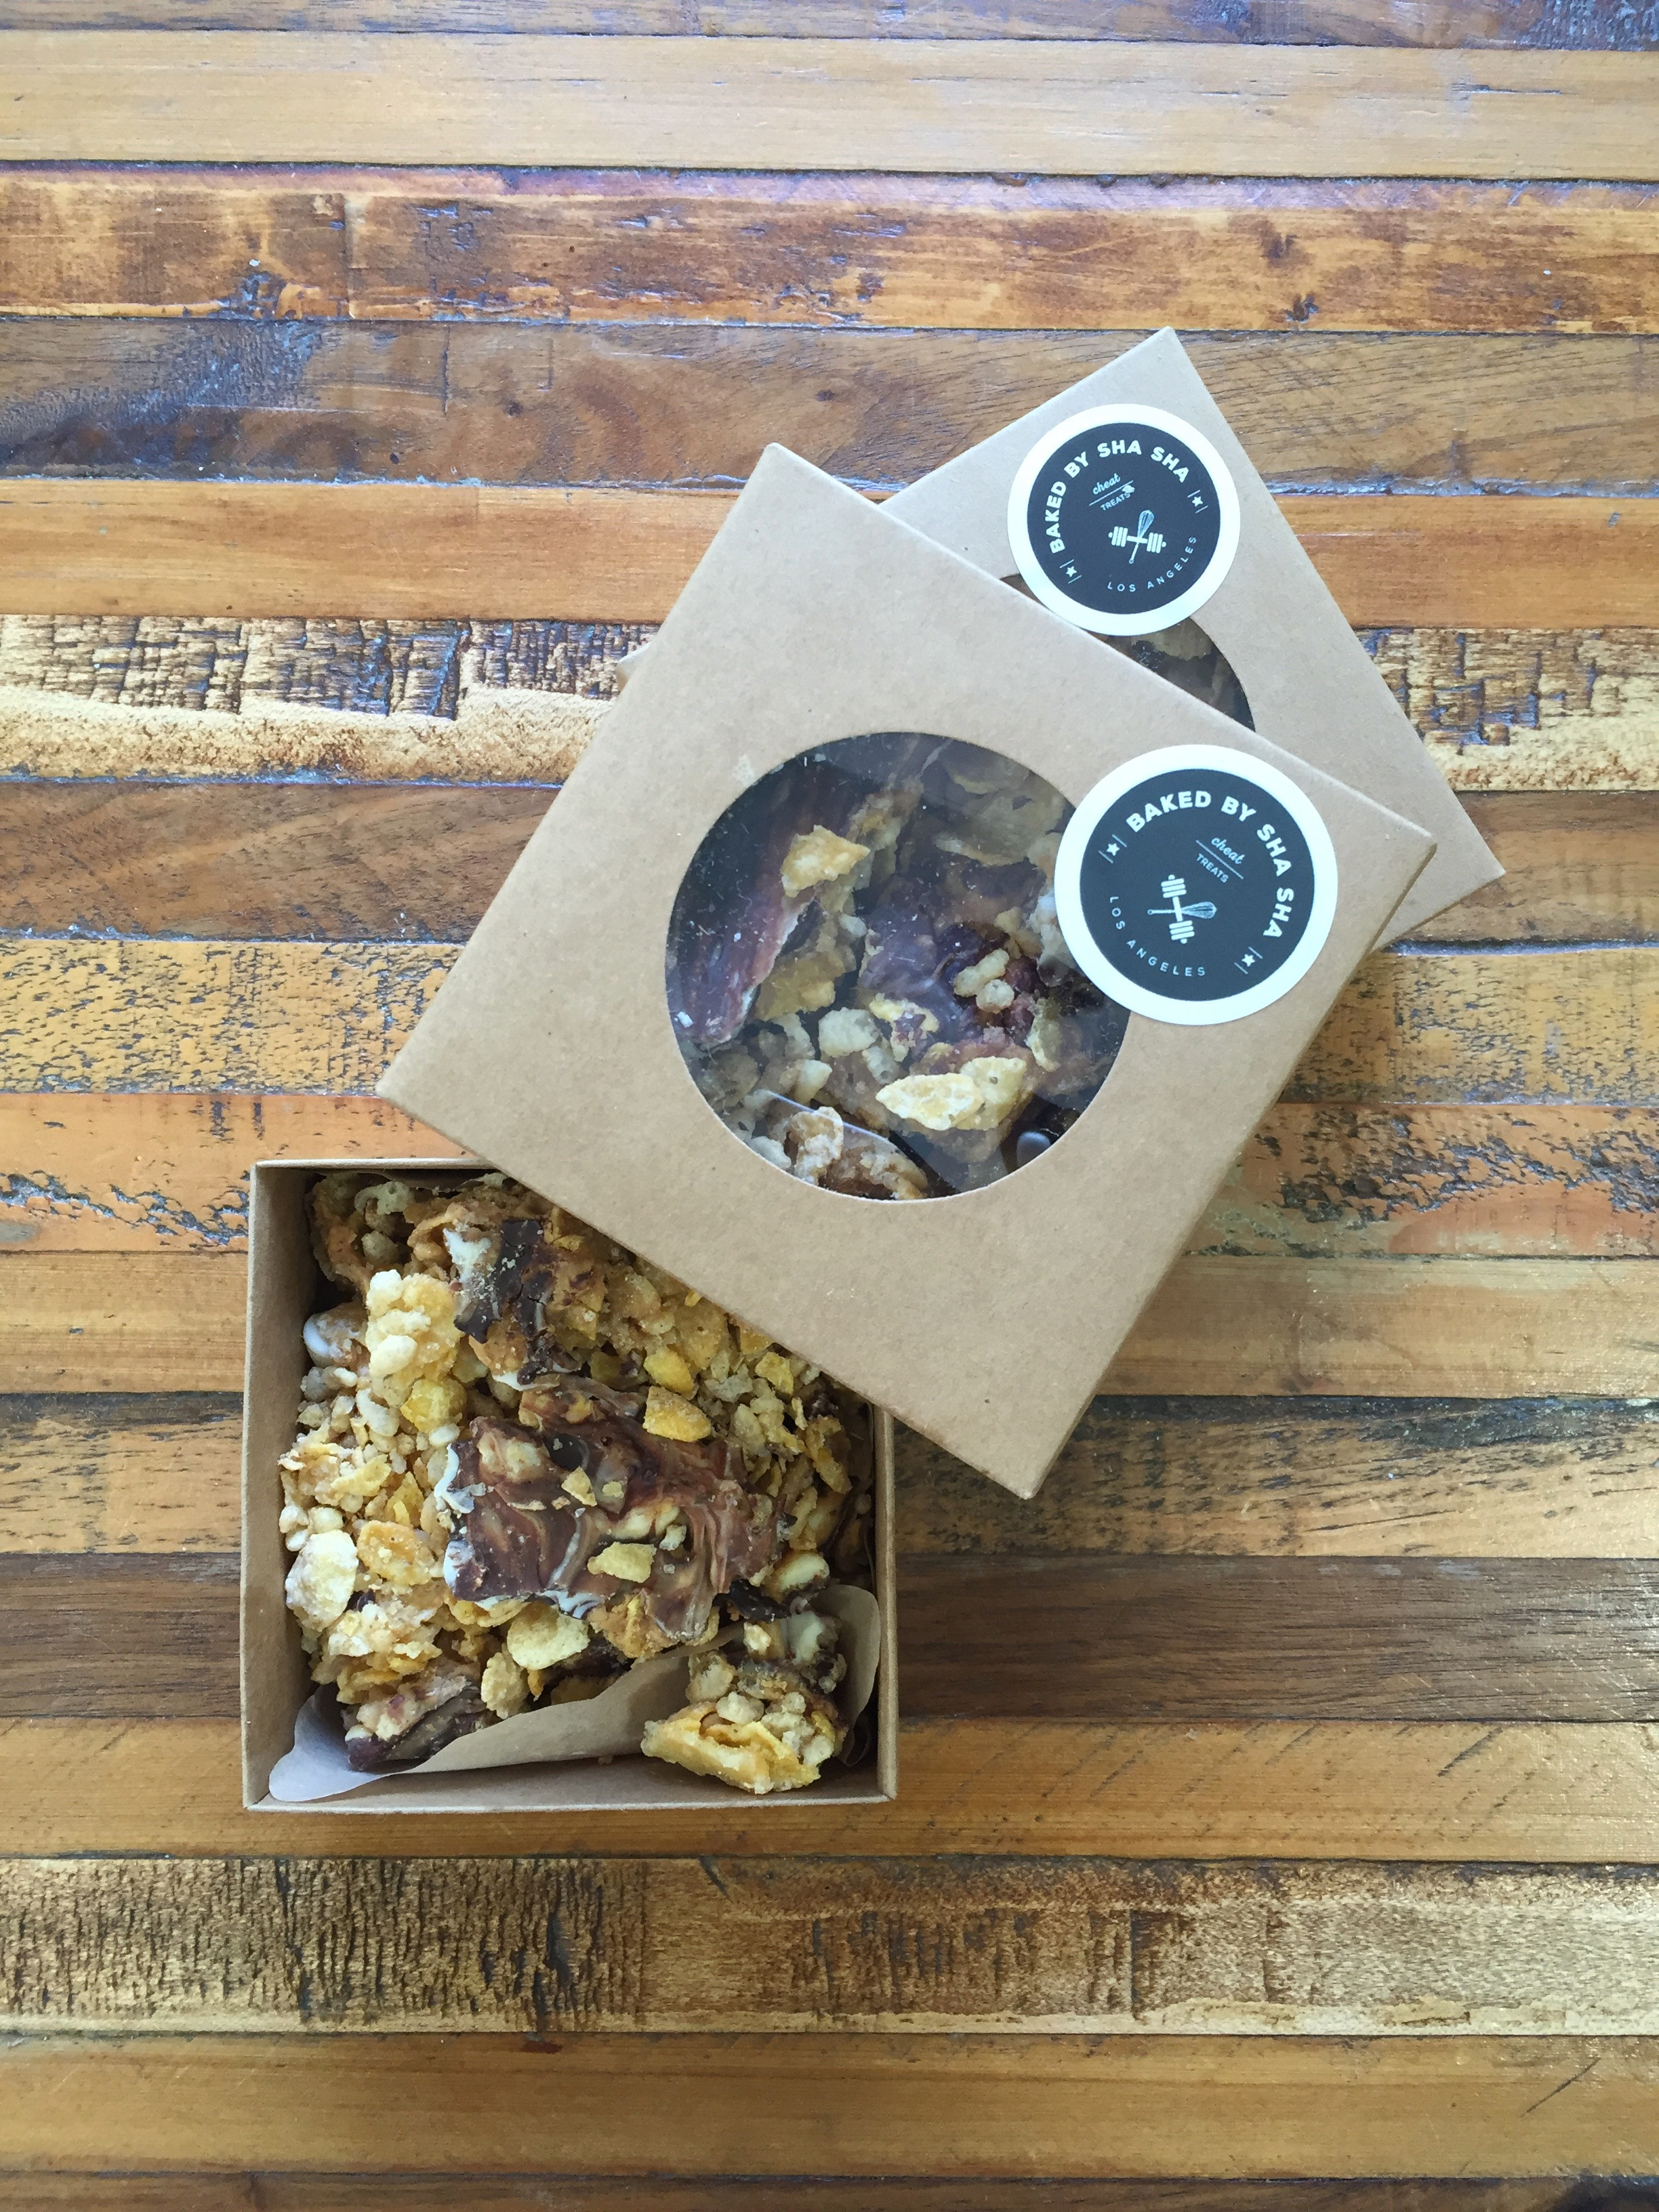 cereal brittle at Om Nom Organics in downtown LA .. @omnomorganics